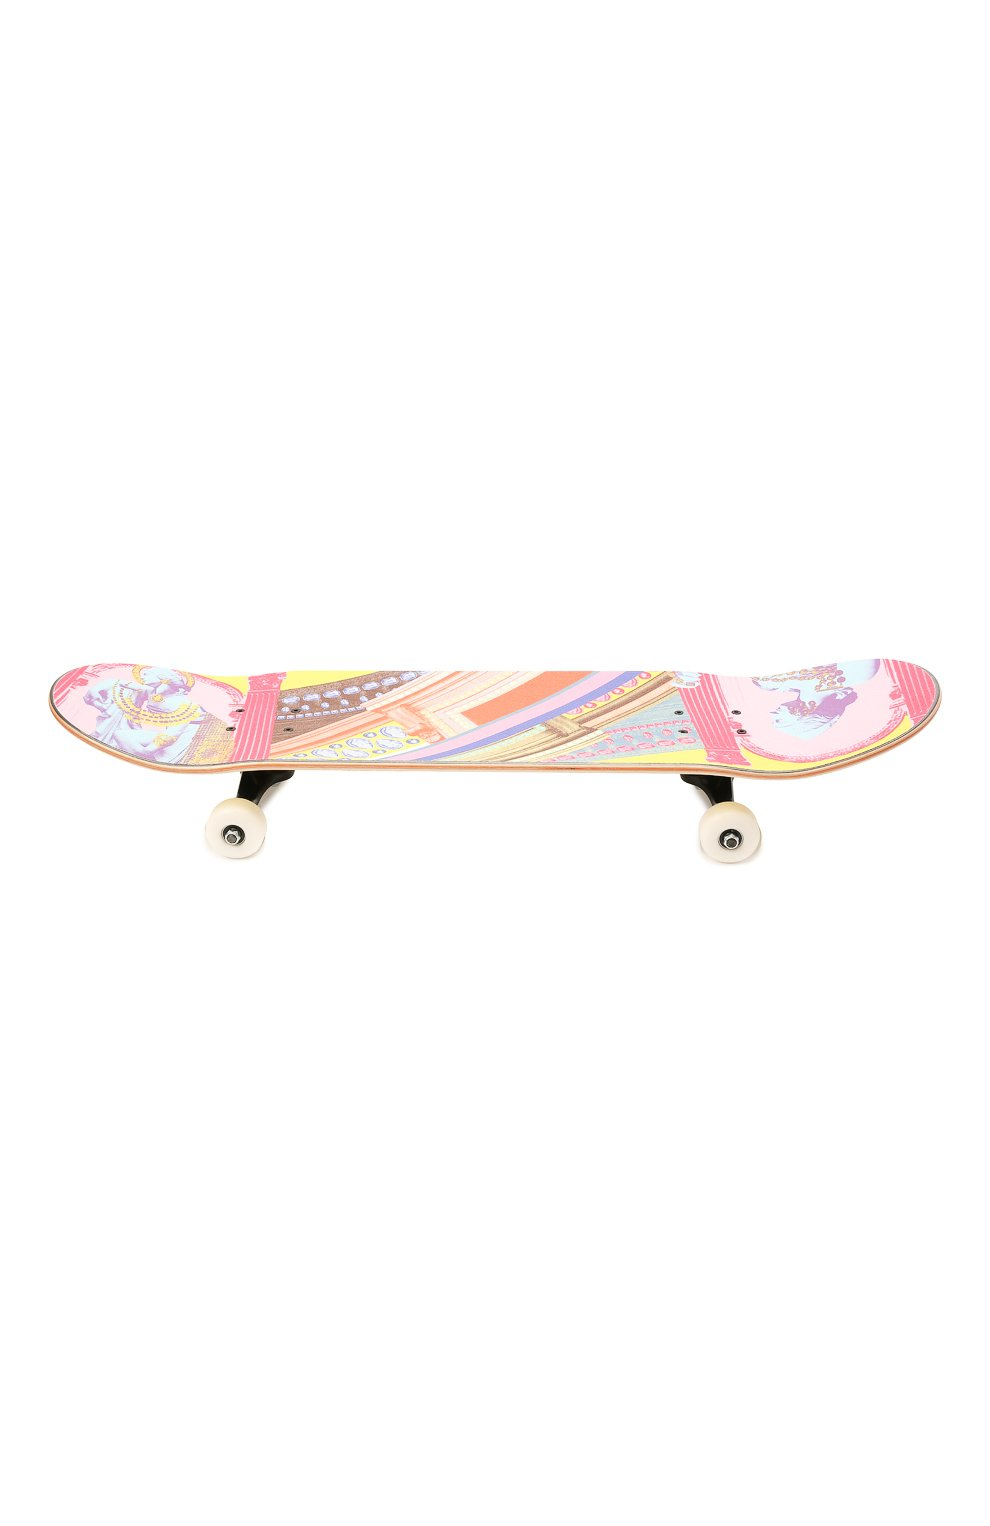 Детского скейтборд VERSACE разноцветного цвета, арт. ZSKATE001/ZW00D001 | Фото 1 (Материал: Дерево)